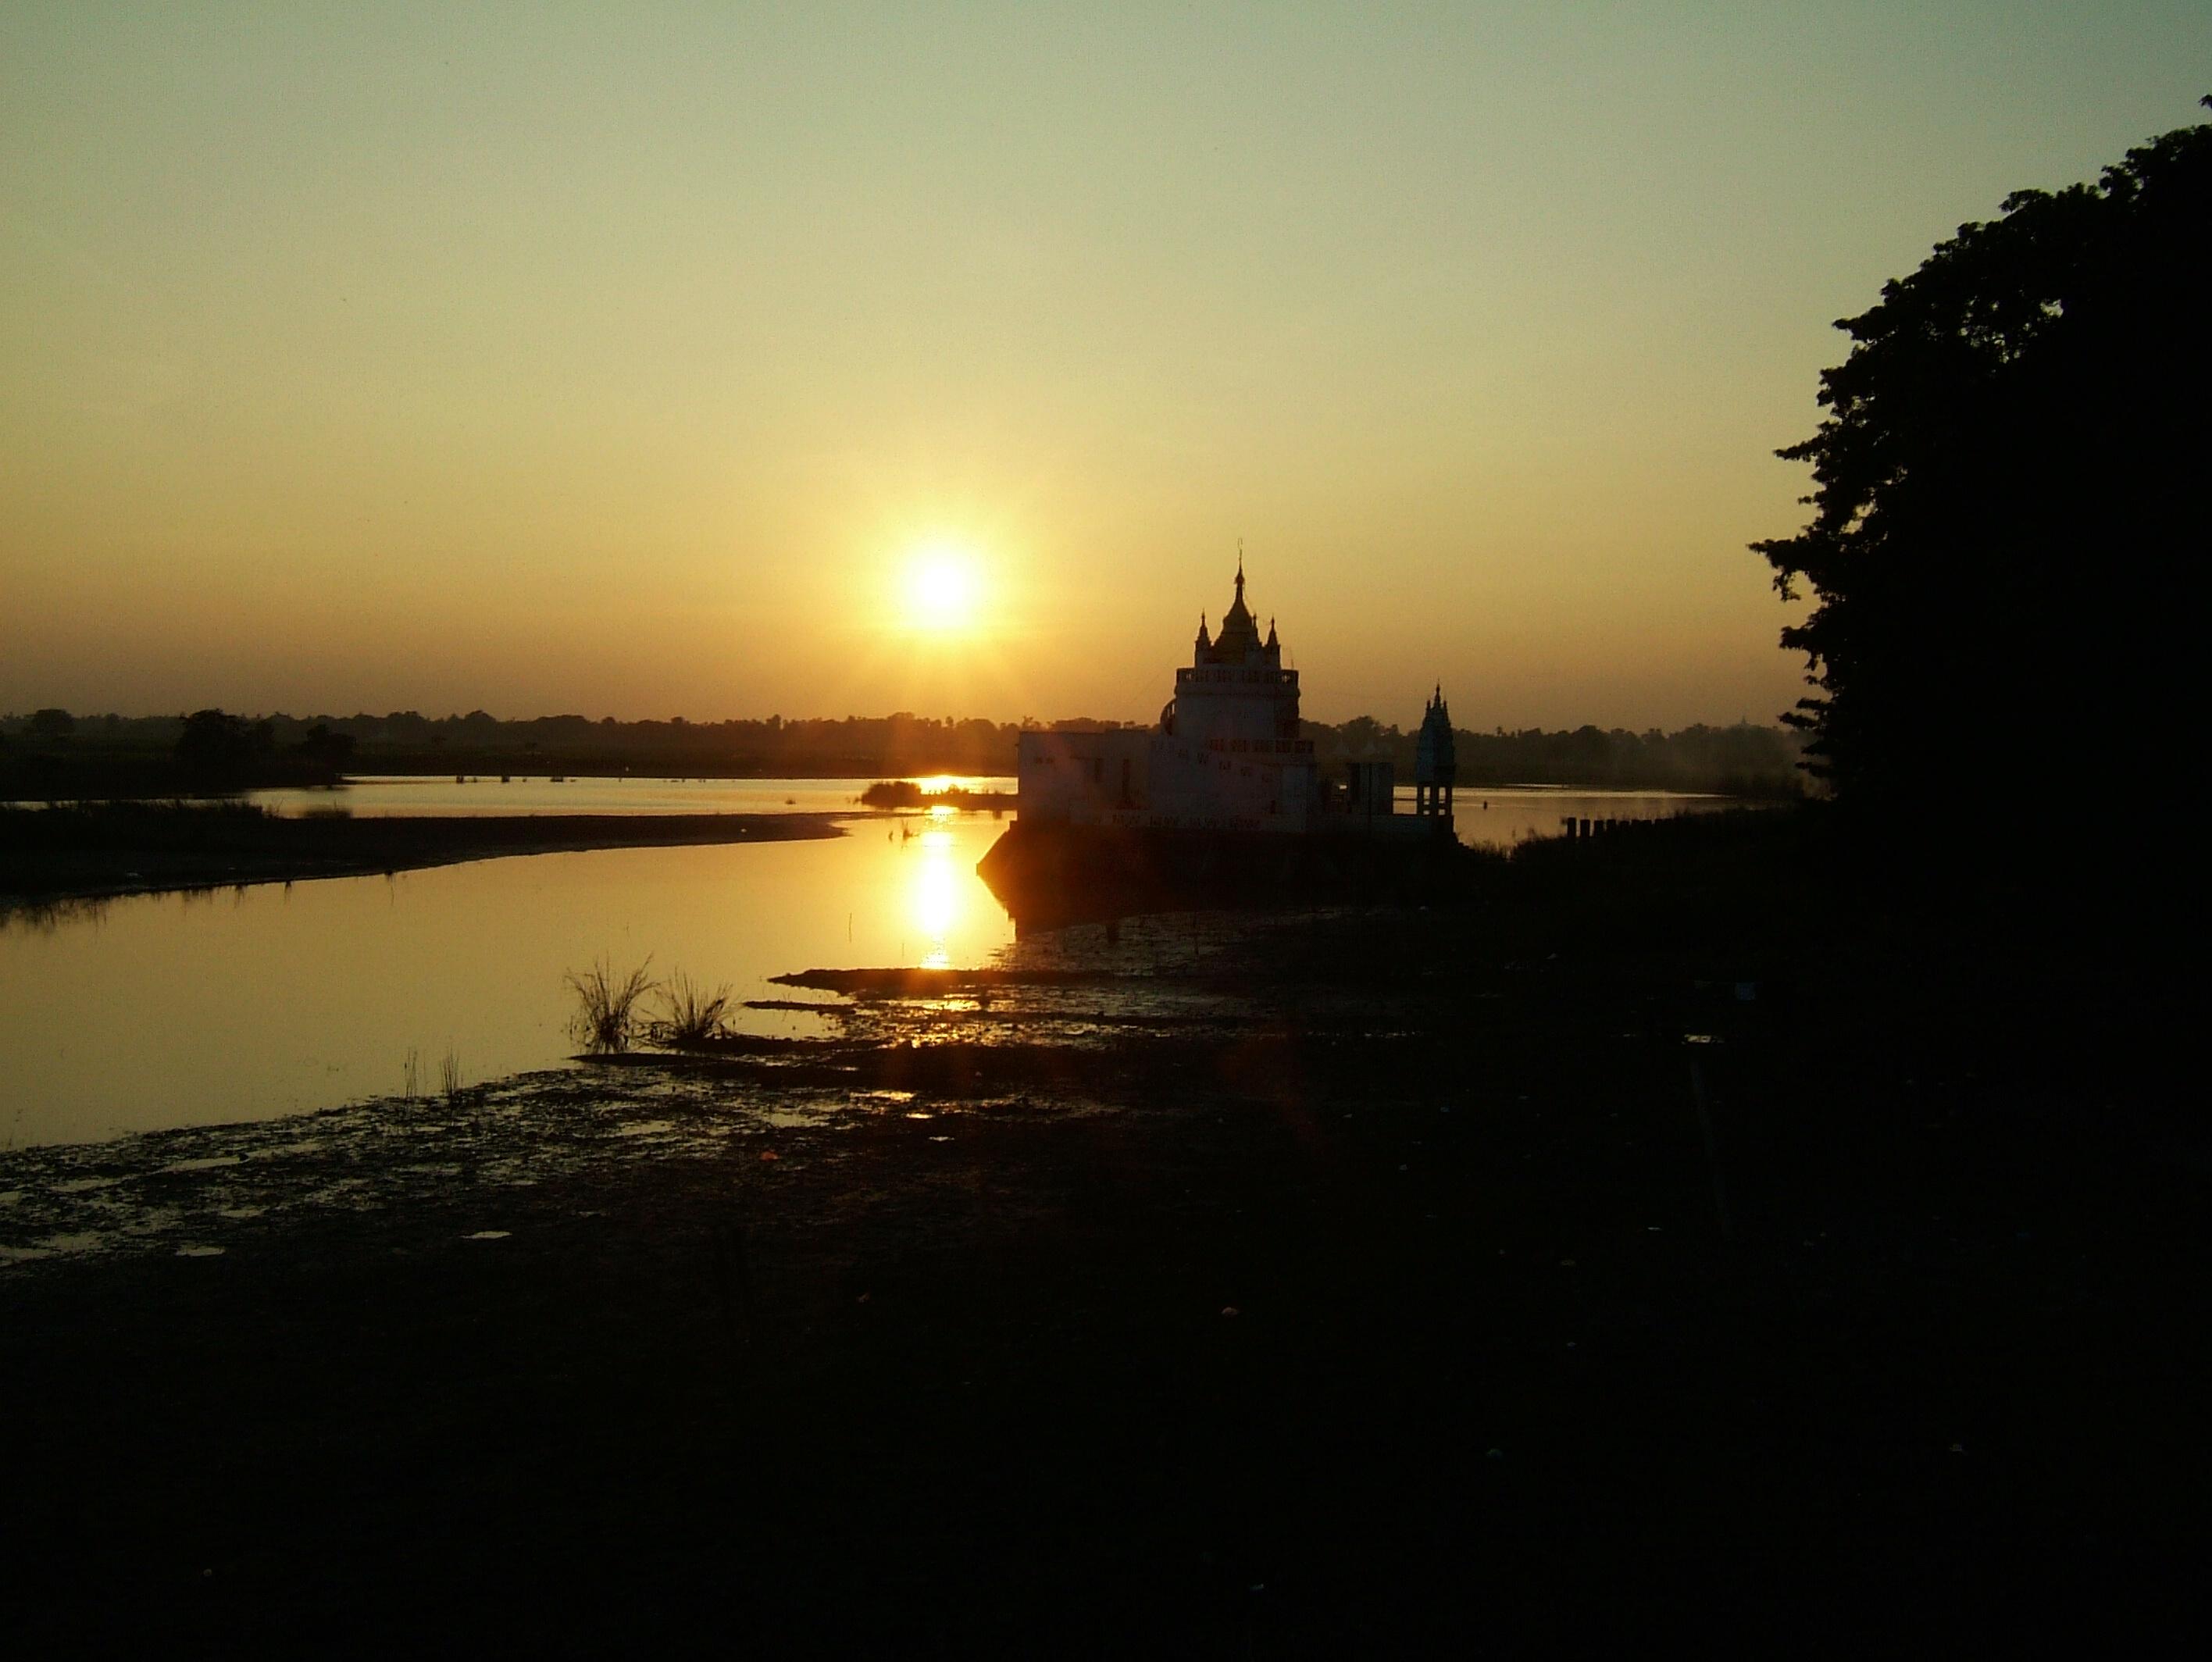 Sunset Myanmar Amarapura Mandalay 01